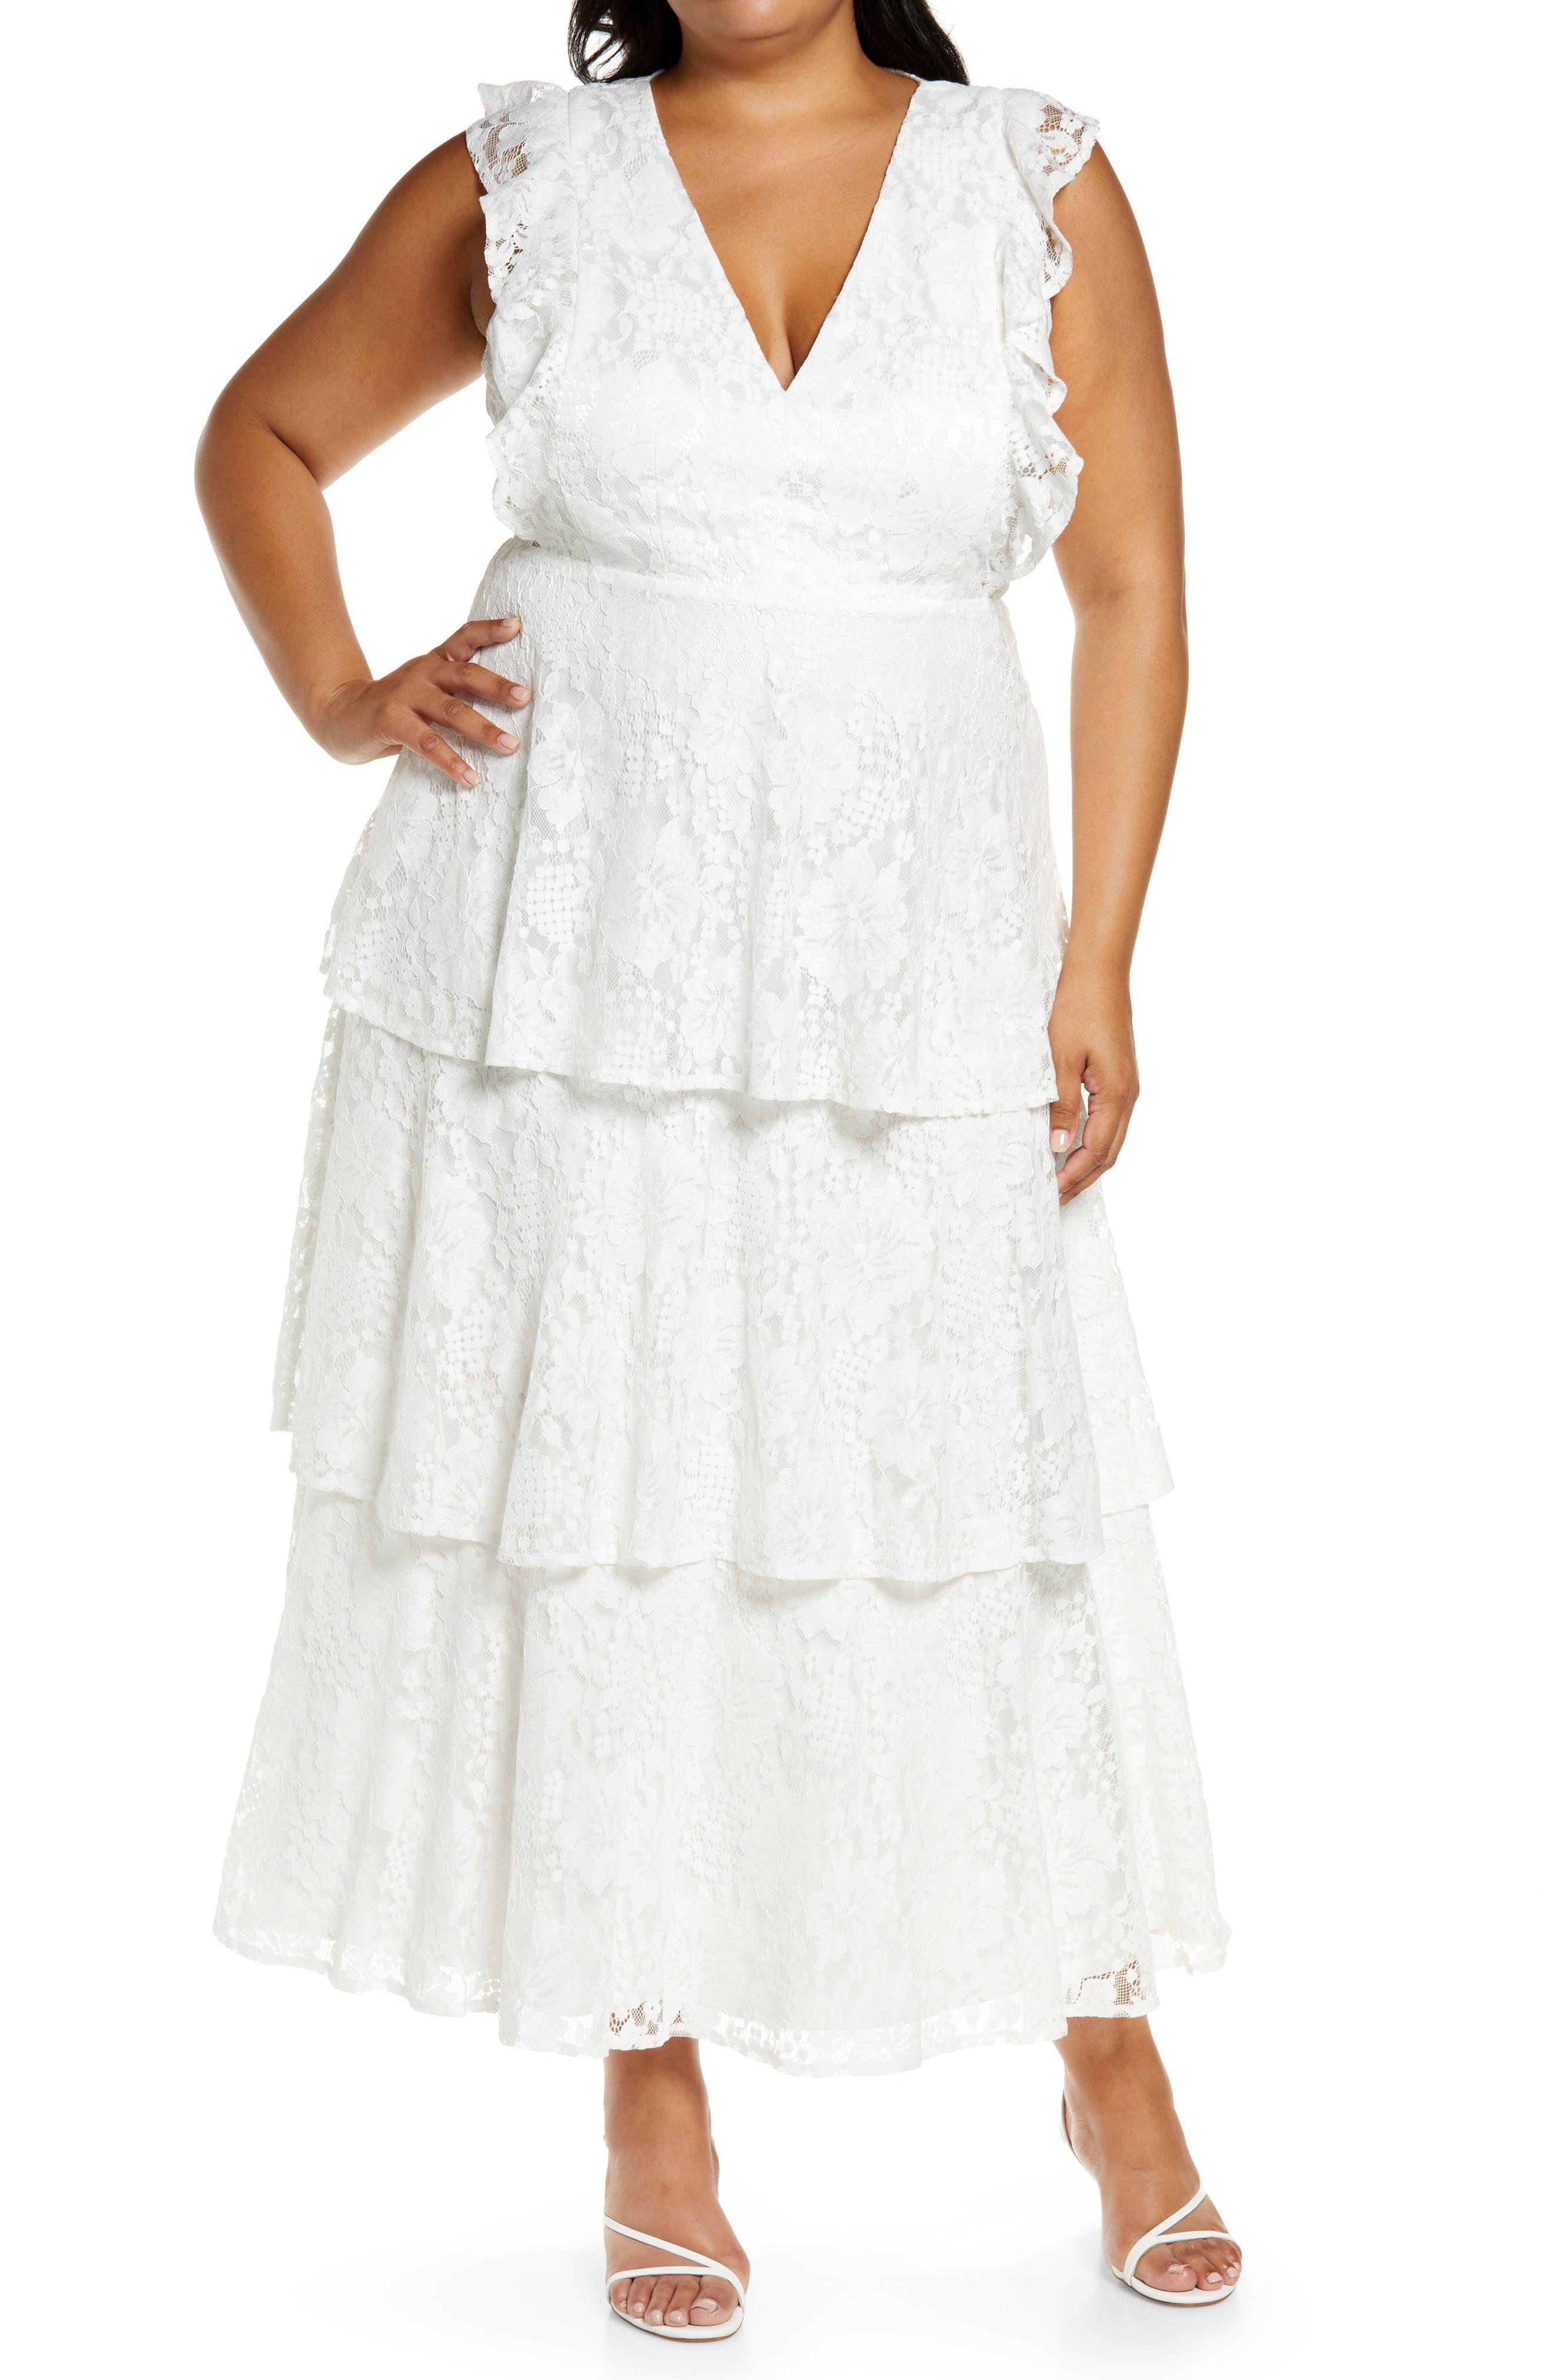 Molinetto Lace Ruffle Tiered Dress